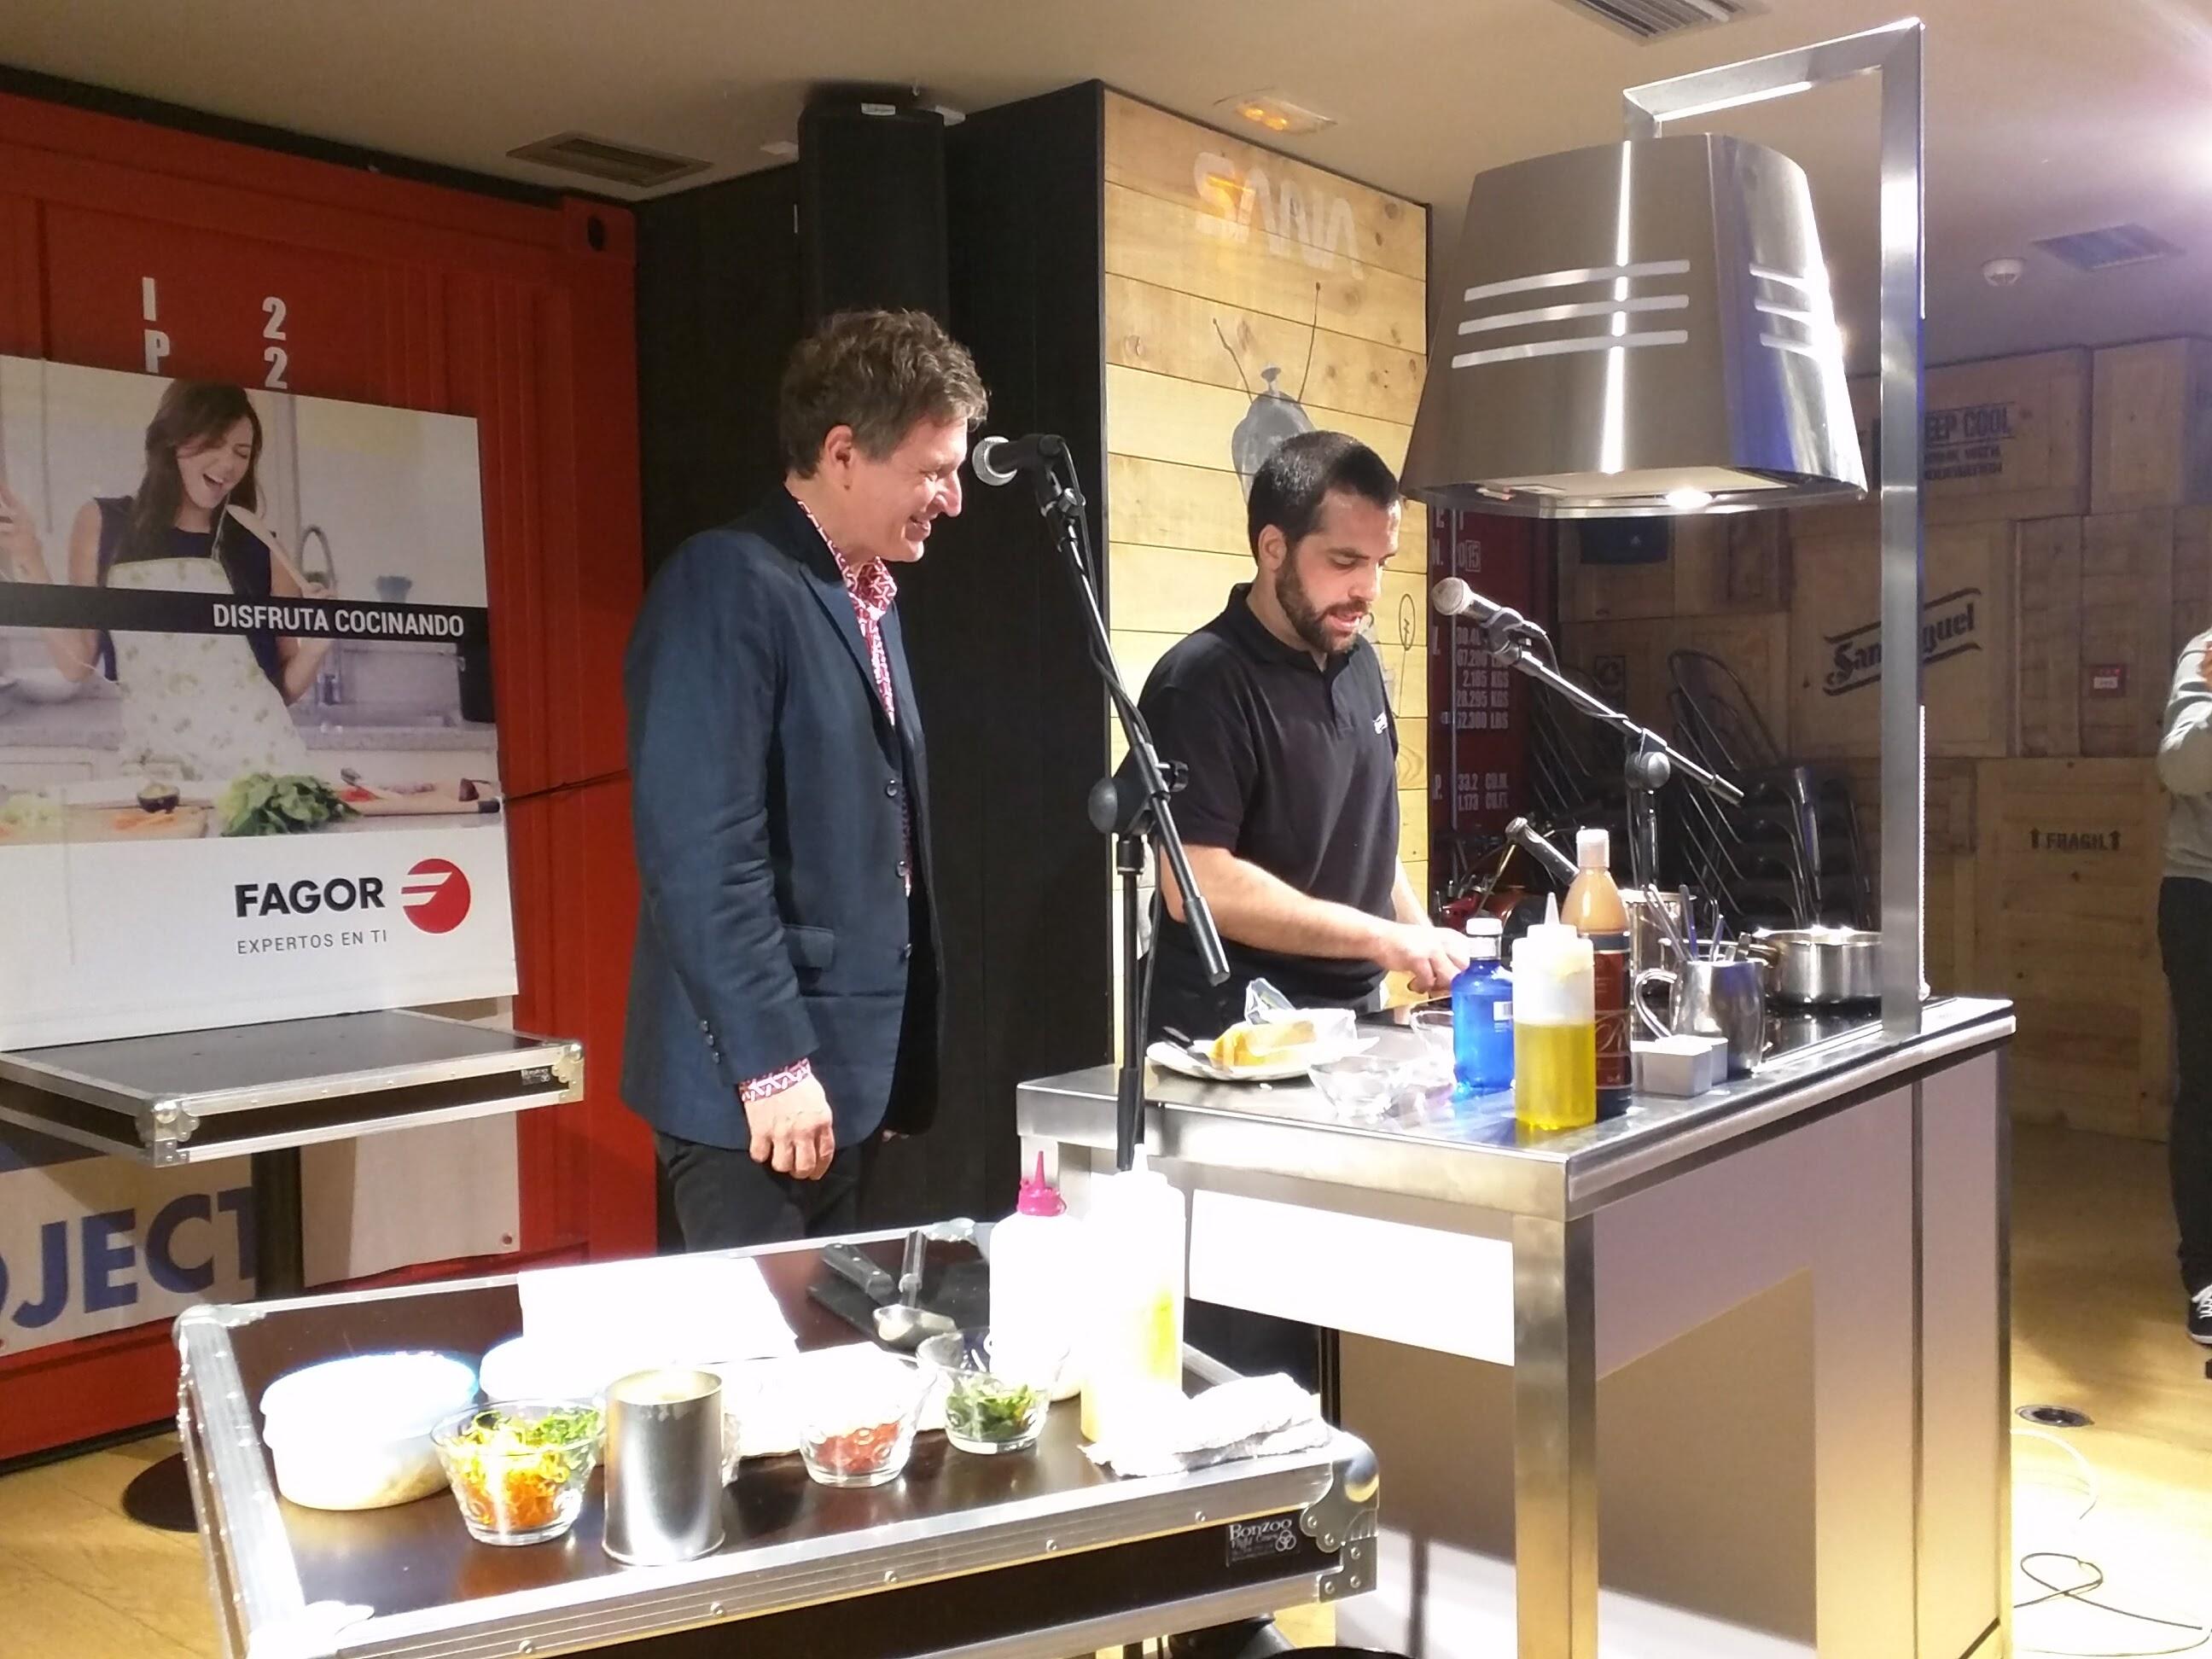 El show cooking en Satélite T, donde participó este servidor.